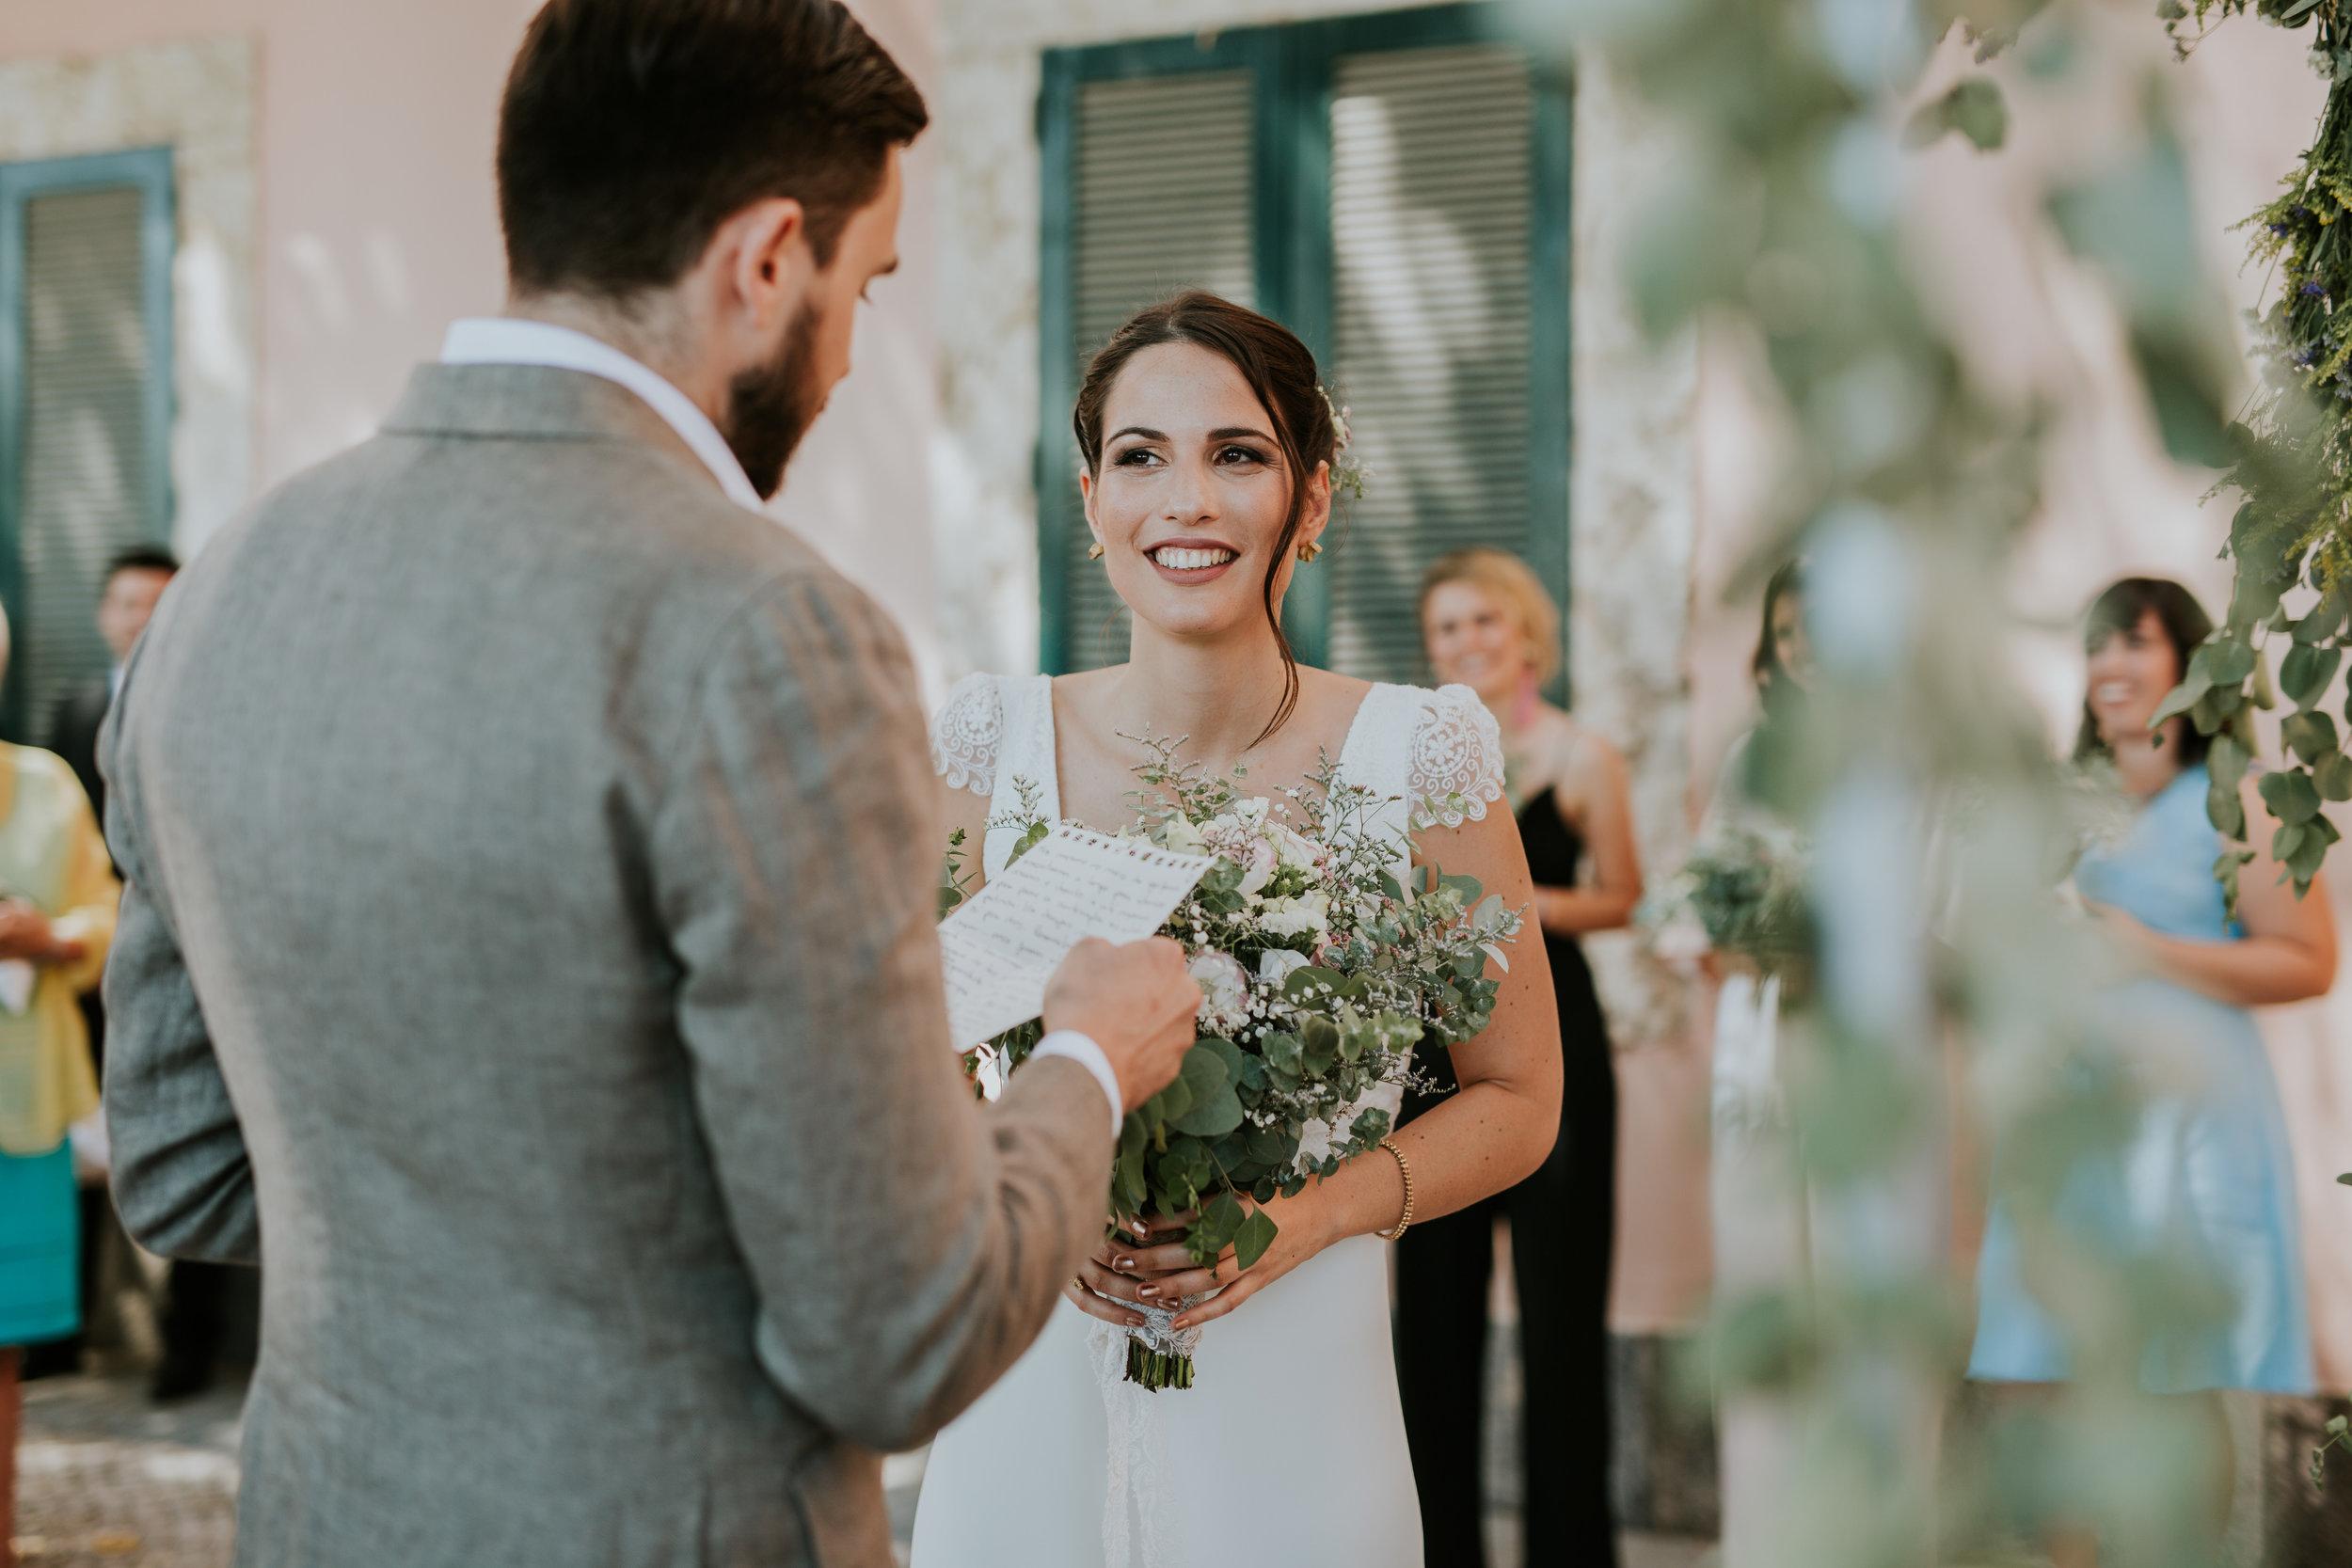 J&P 249_ 02 setembro 2017 Wedding day_.jpg